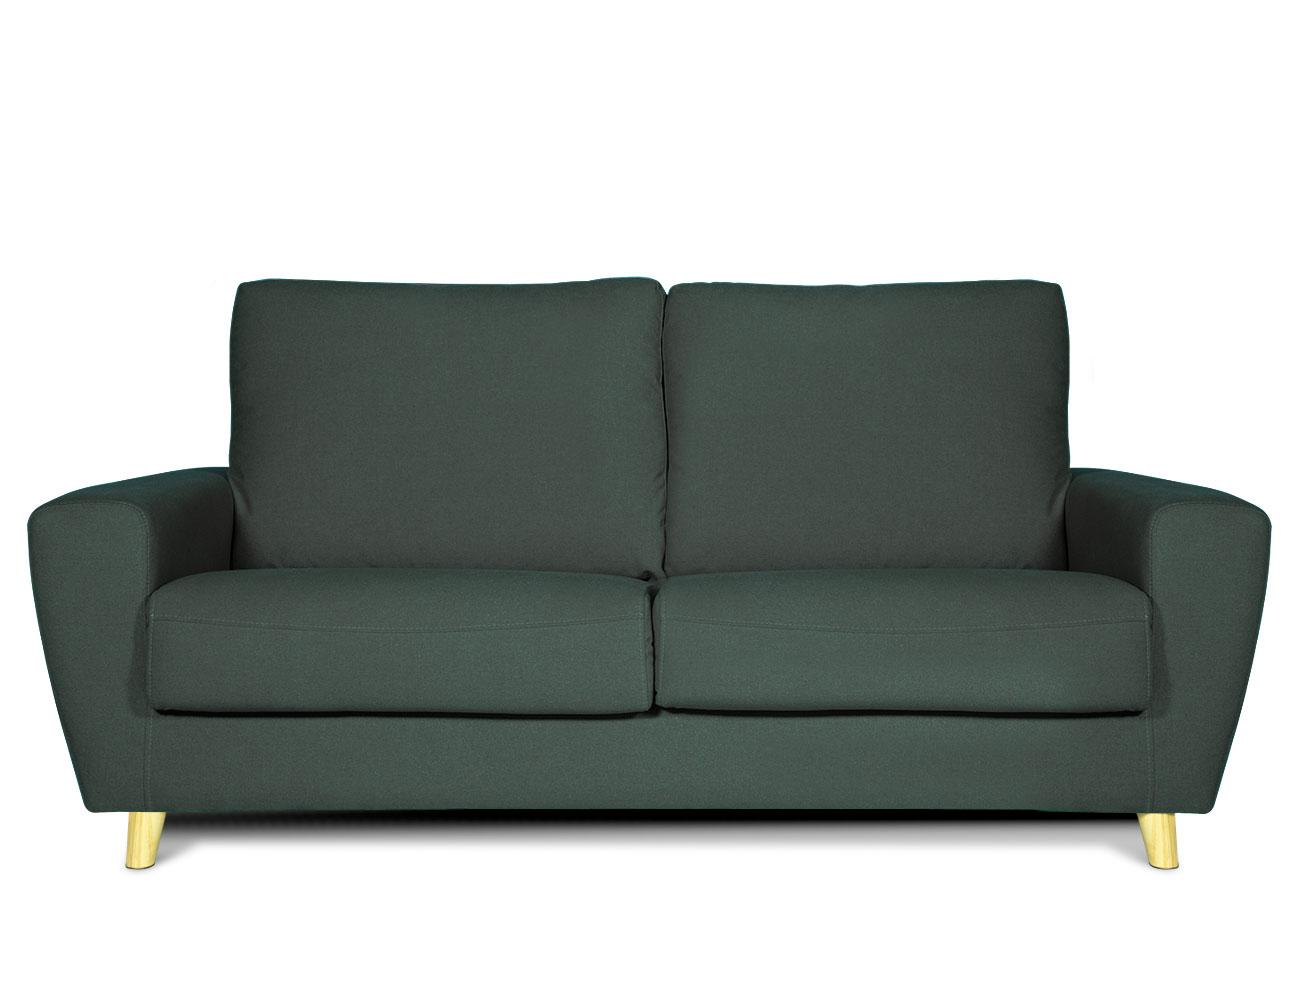 Sofa 3 plazas moderno grafito